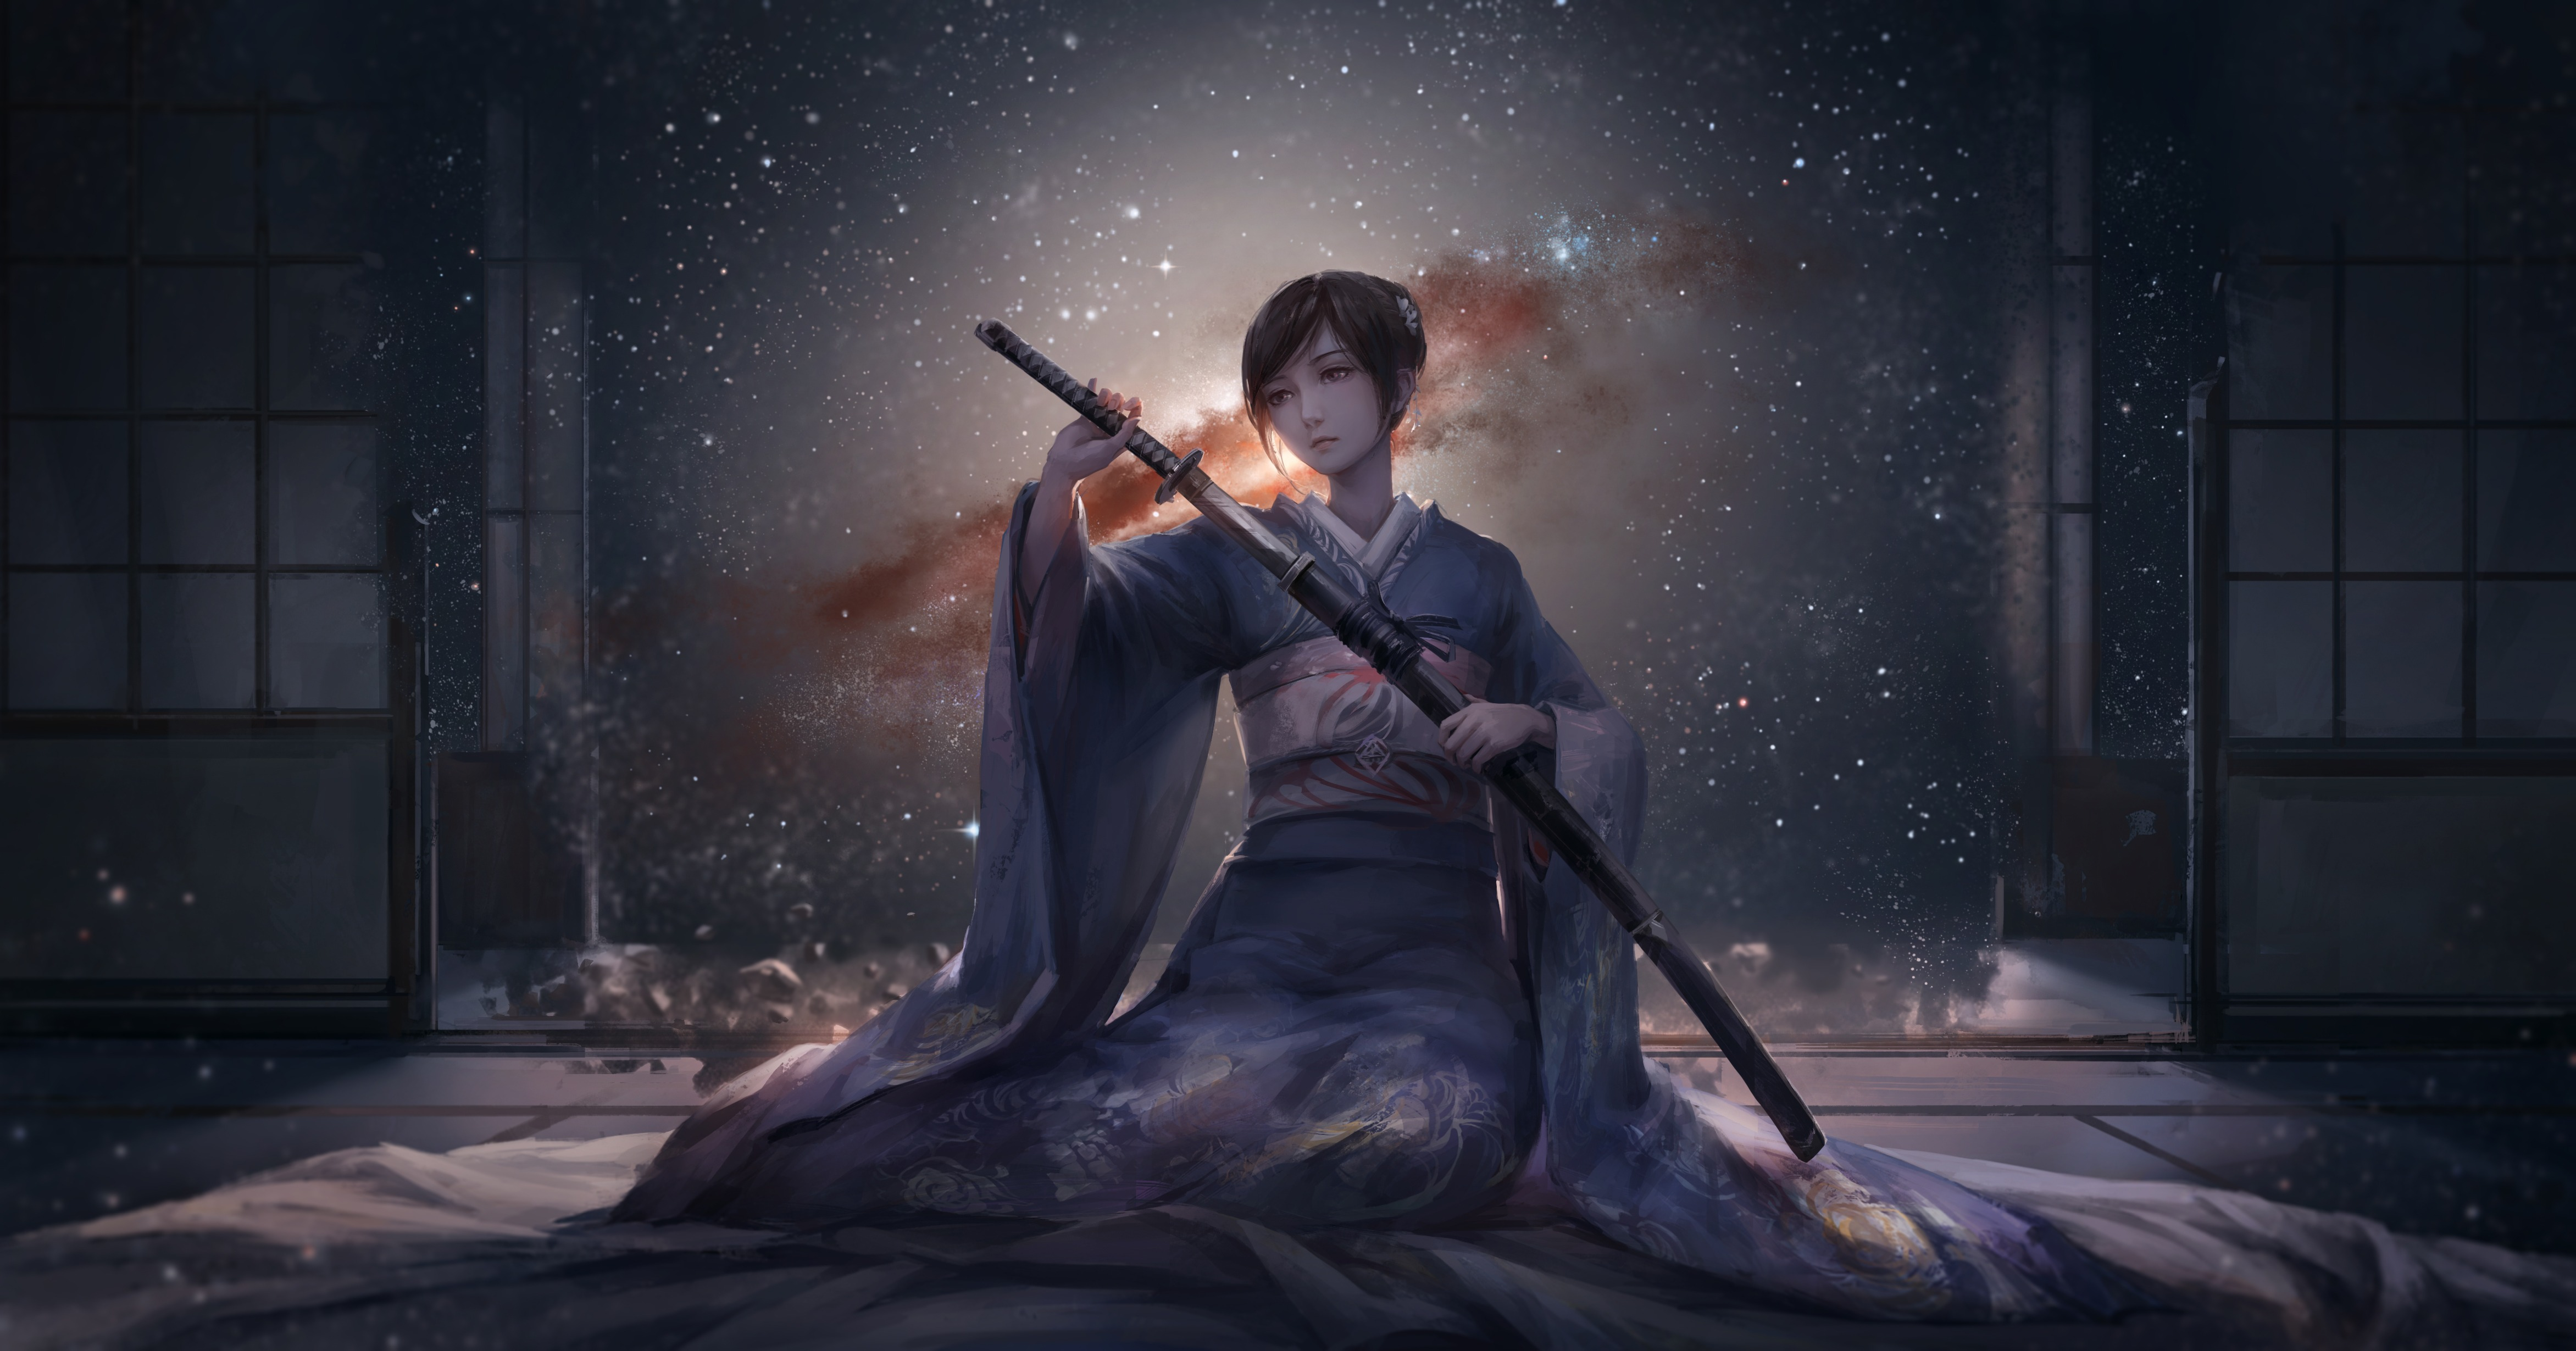 【P站画师】中国画师 JLIEN-的插画作品- ACG17.COM